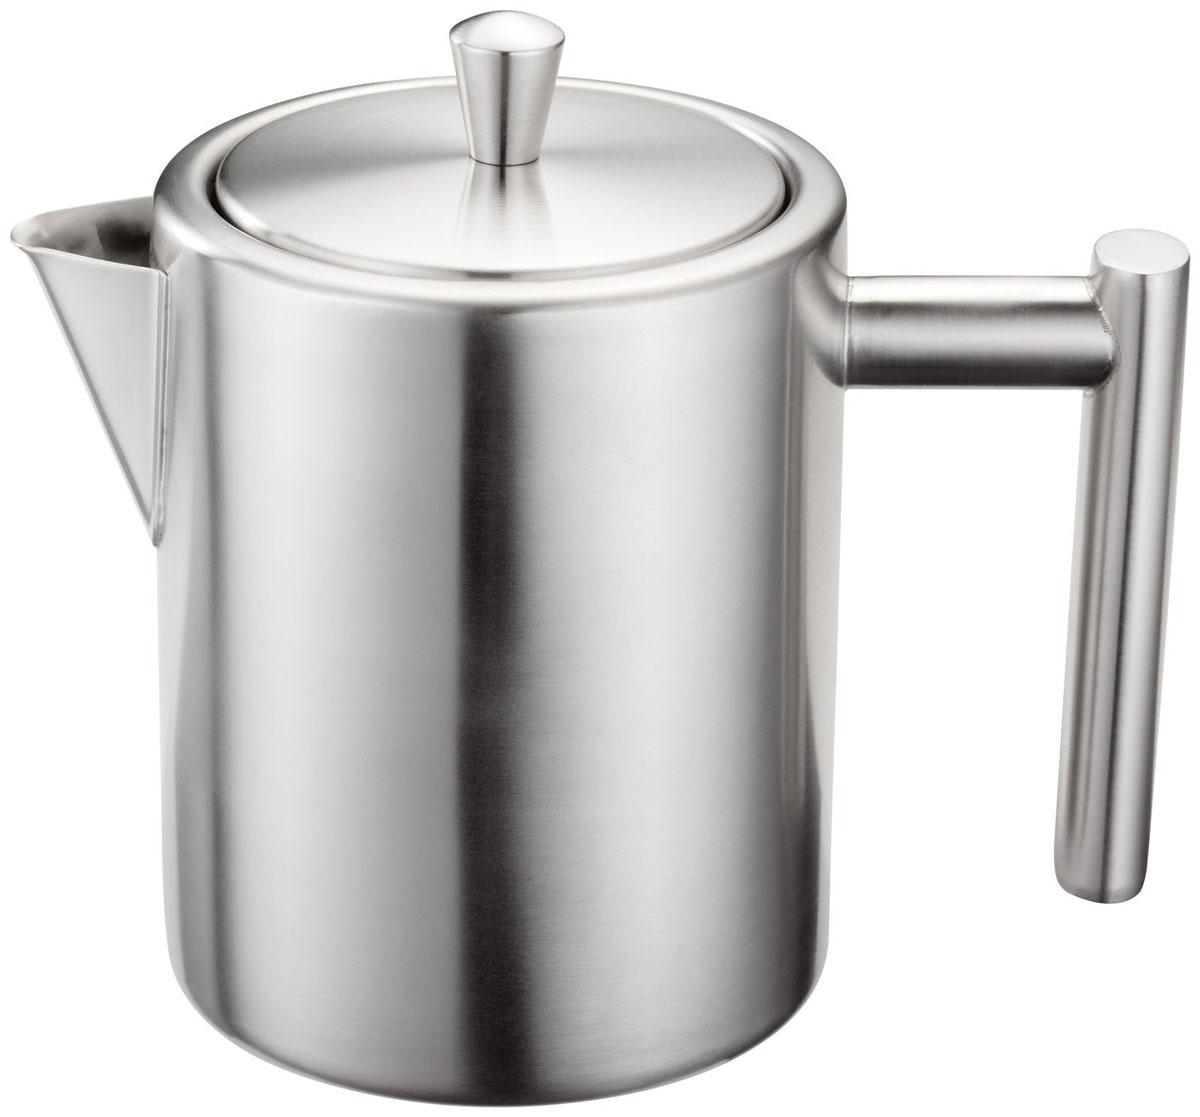 Чайник заварочный Silampos Oslo, цвет: матовая сталь, 600 мл. 41281318SM90